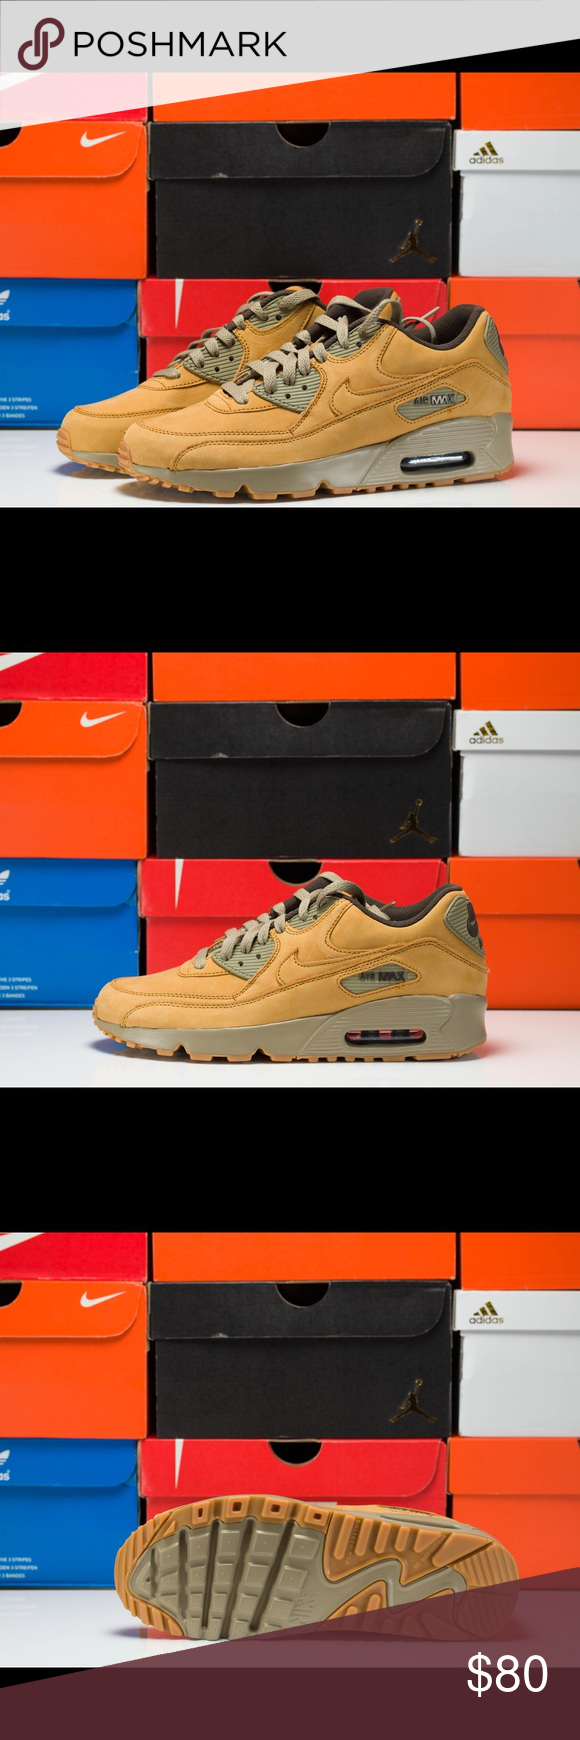 "new style 37b50 5289f Nike Air Max 90 Winter GS ""Wheat"" ( 888167-700 ) Nike Air Max 90 Winter GS  Size  7Y   8.5 Women s ( UK 6   EUR 40 ) Color  Bronze   Bronze - Baroque  Brown ..."